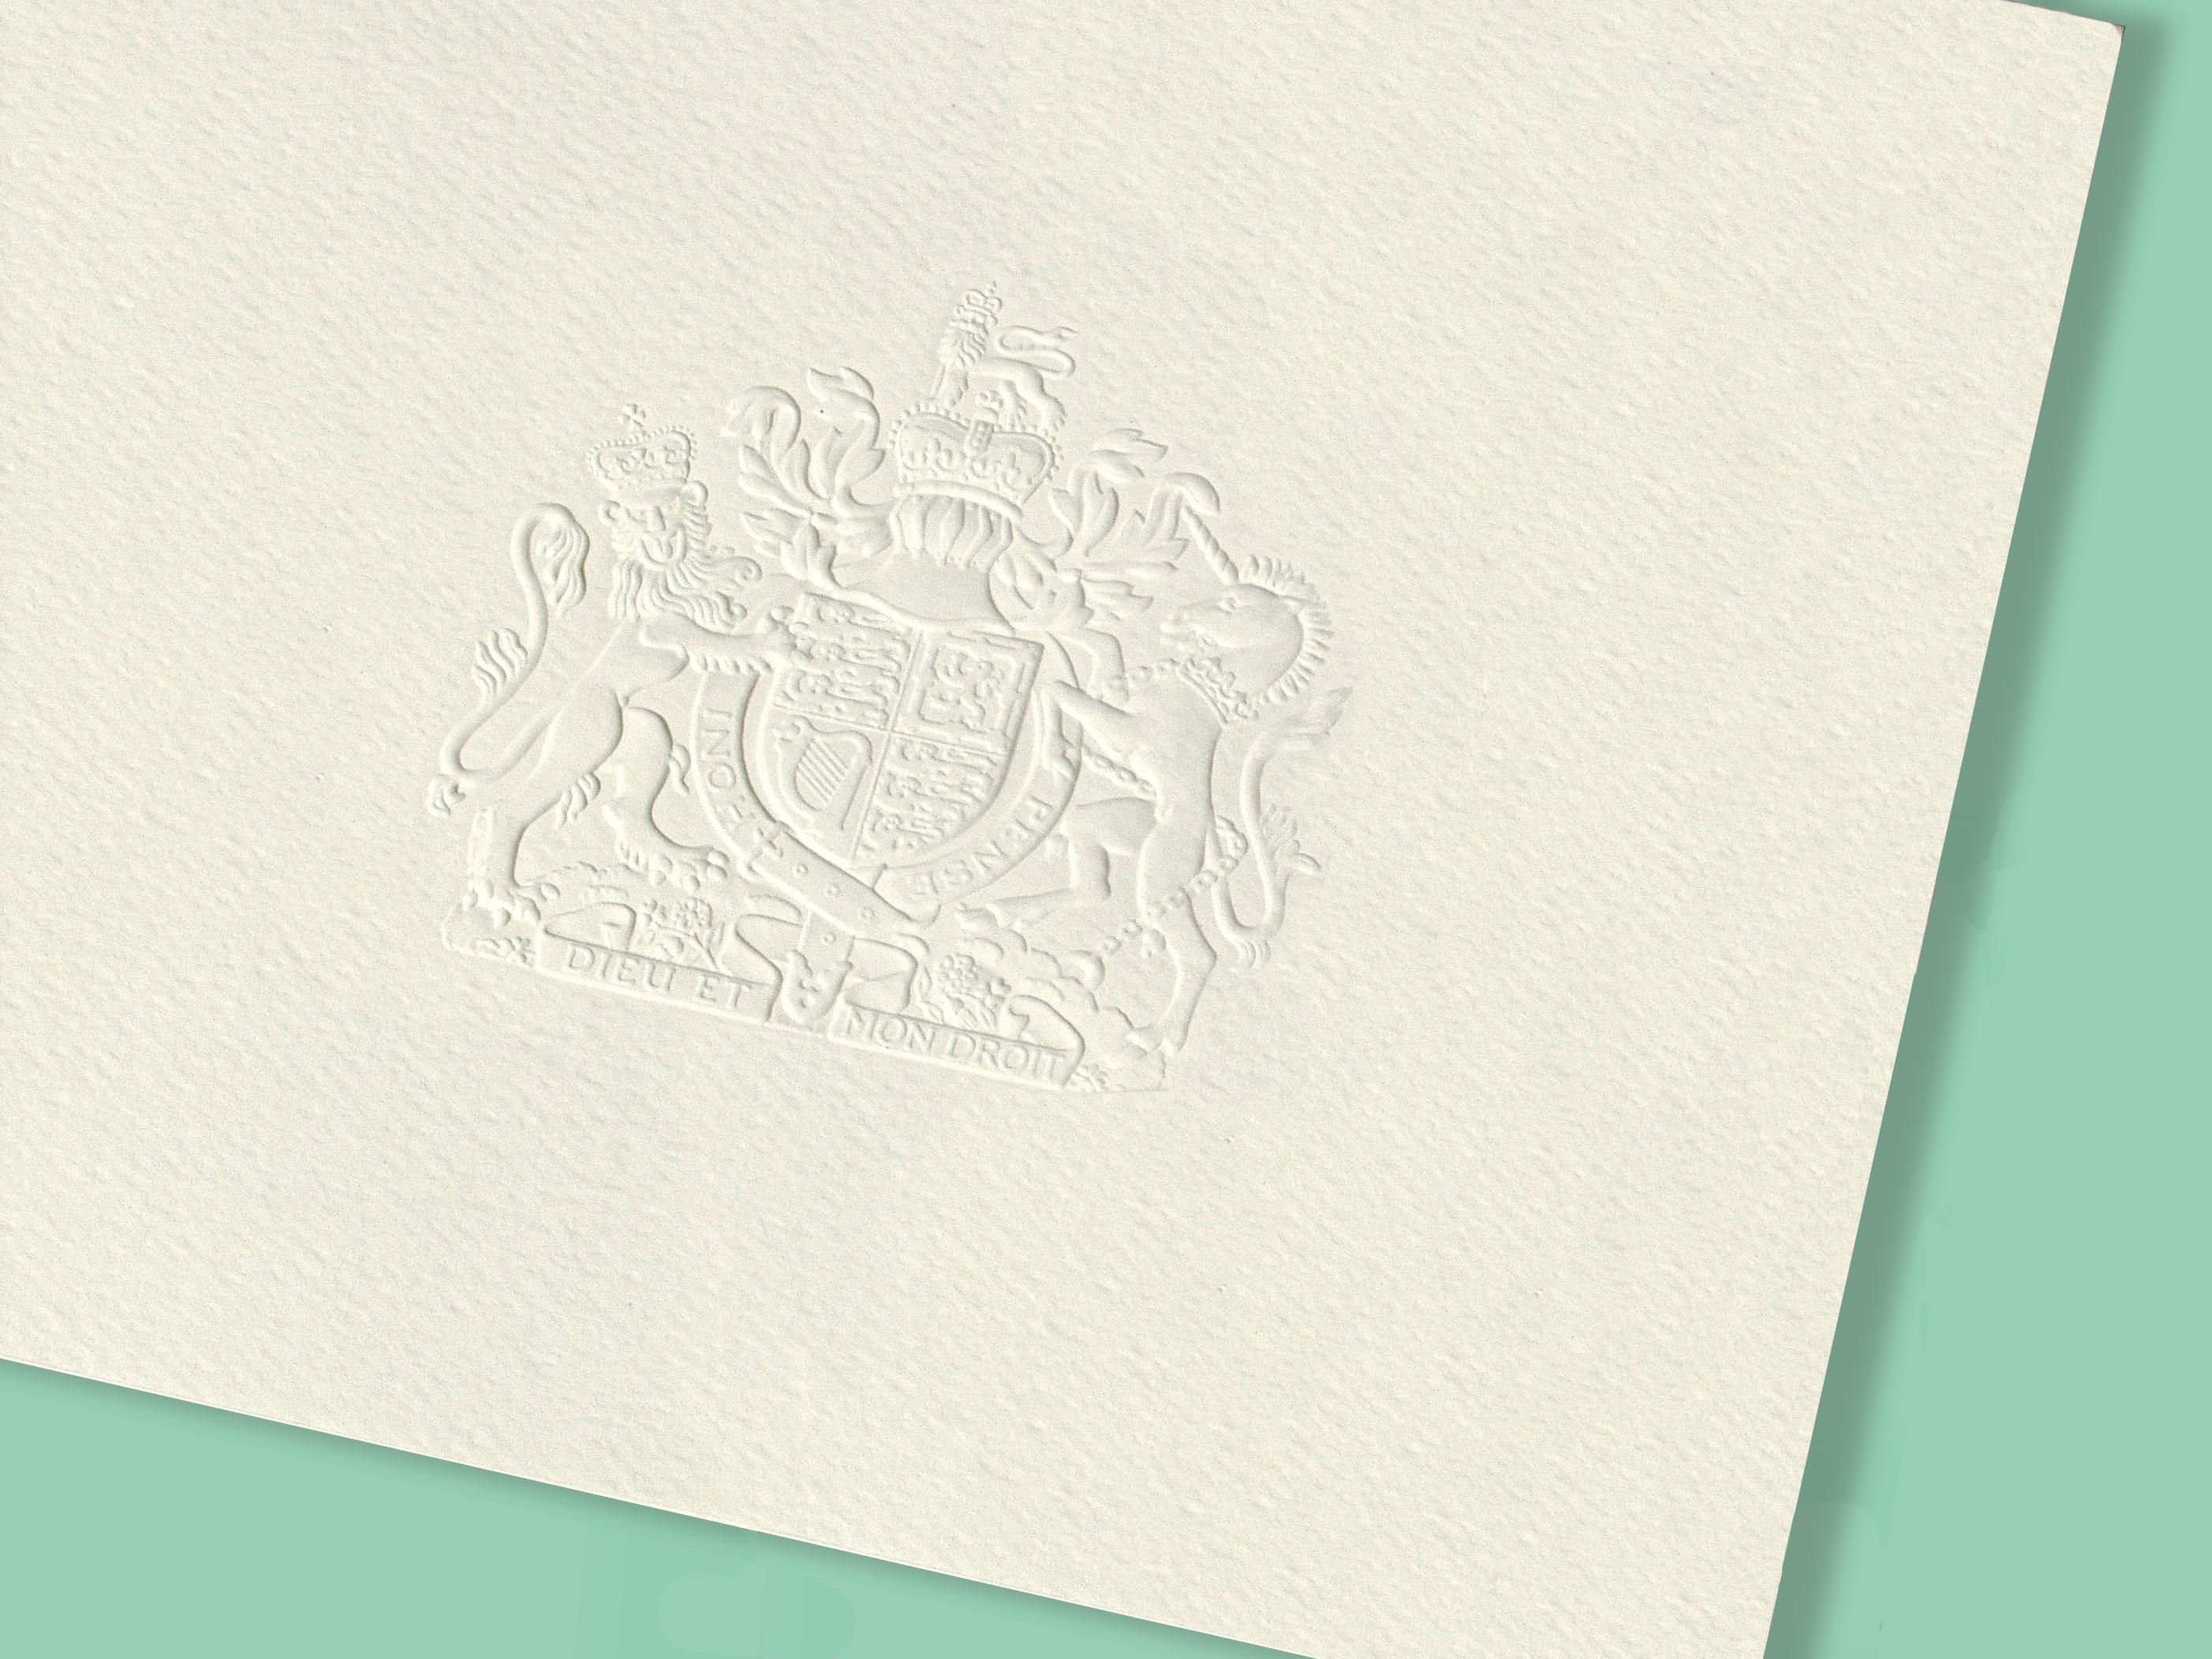 Prince Edward Invite Experiential Marketing Campaign